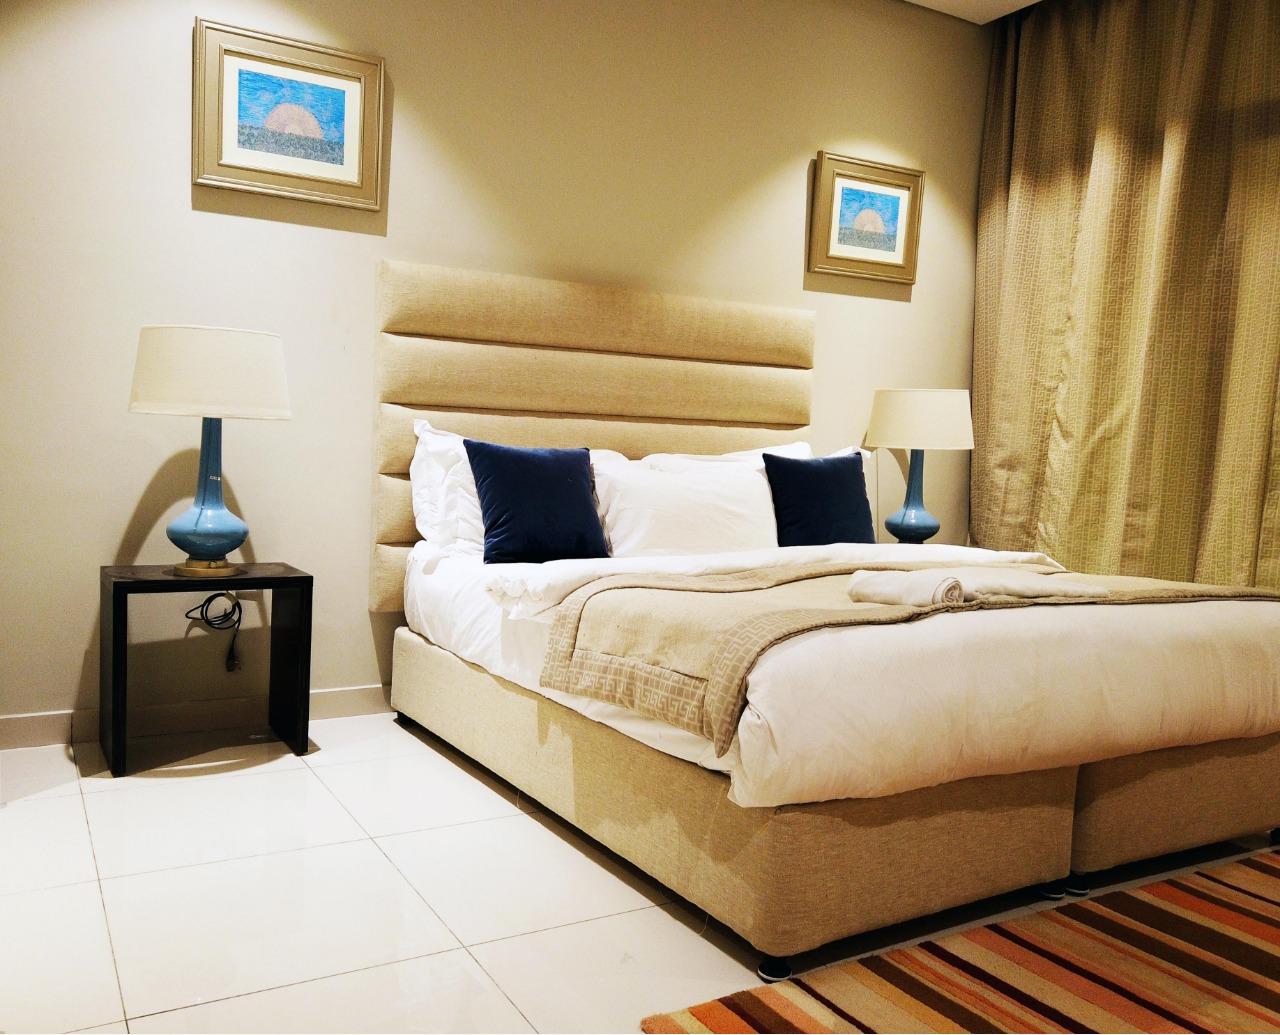 Apartment Meydan Spacious Home Dubai photo 27263215